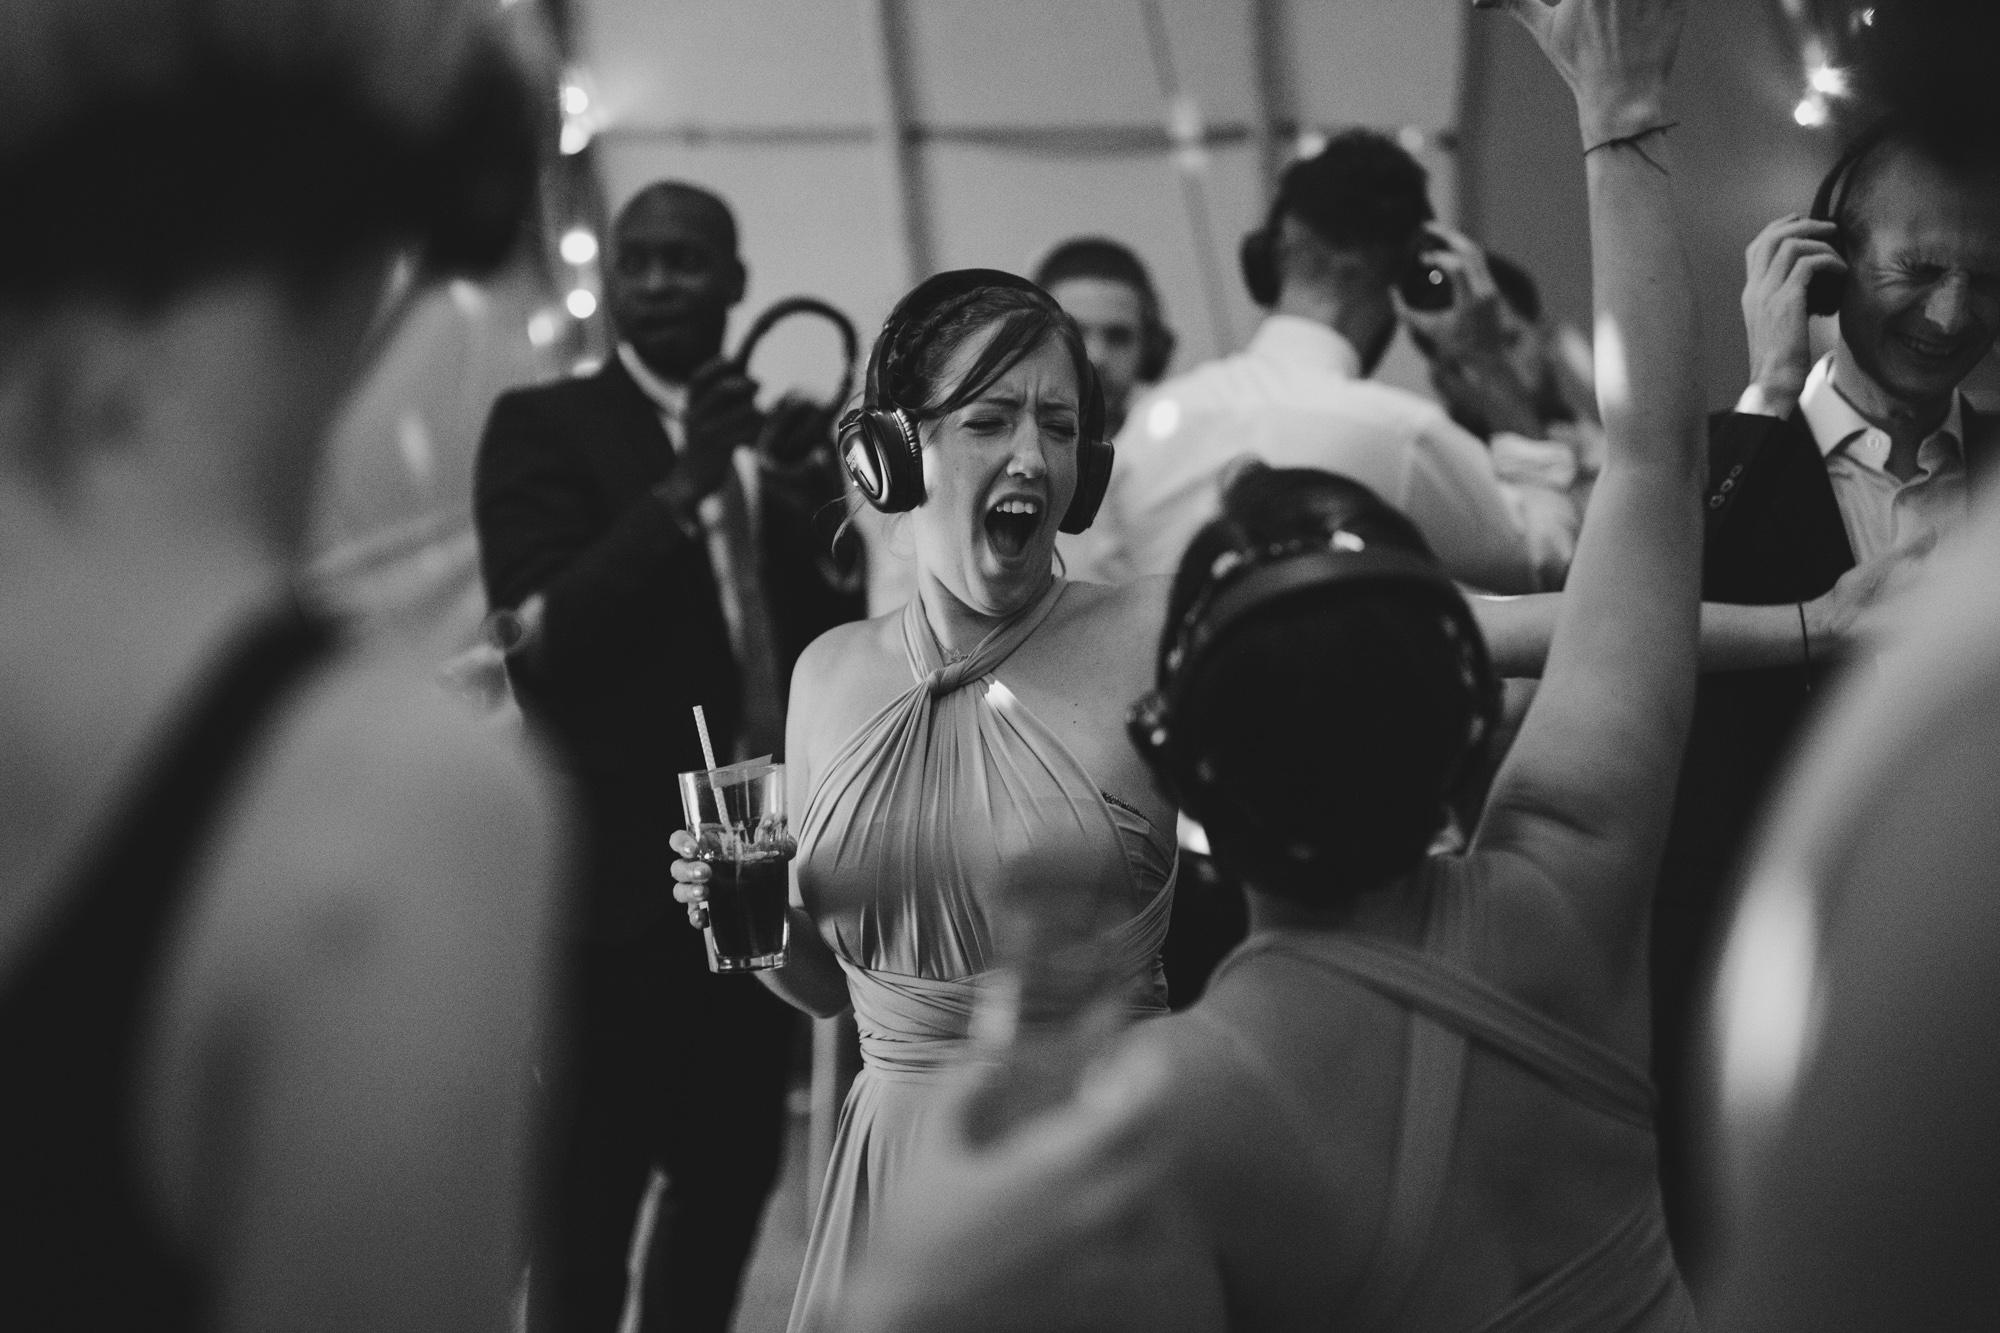 derbyshire-wedding-photographer-filmmaker-carsington-water--21.jpg